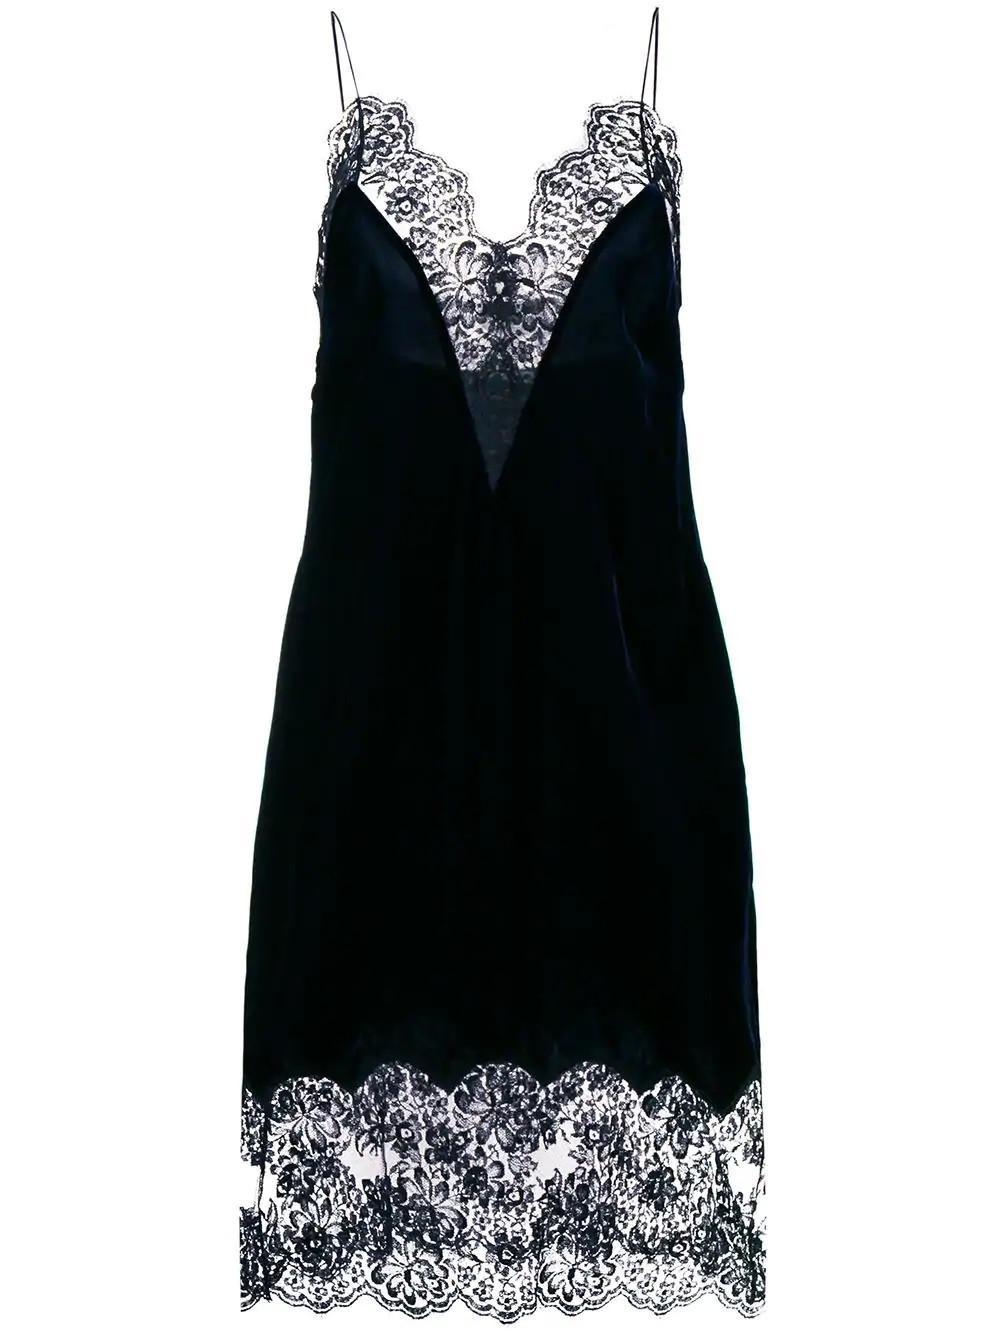 0b67a0dead70c Stella McCartney Lace Slip Dress in Black - Save 49% - Lyst